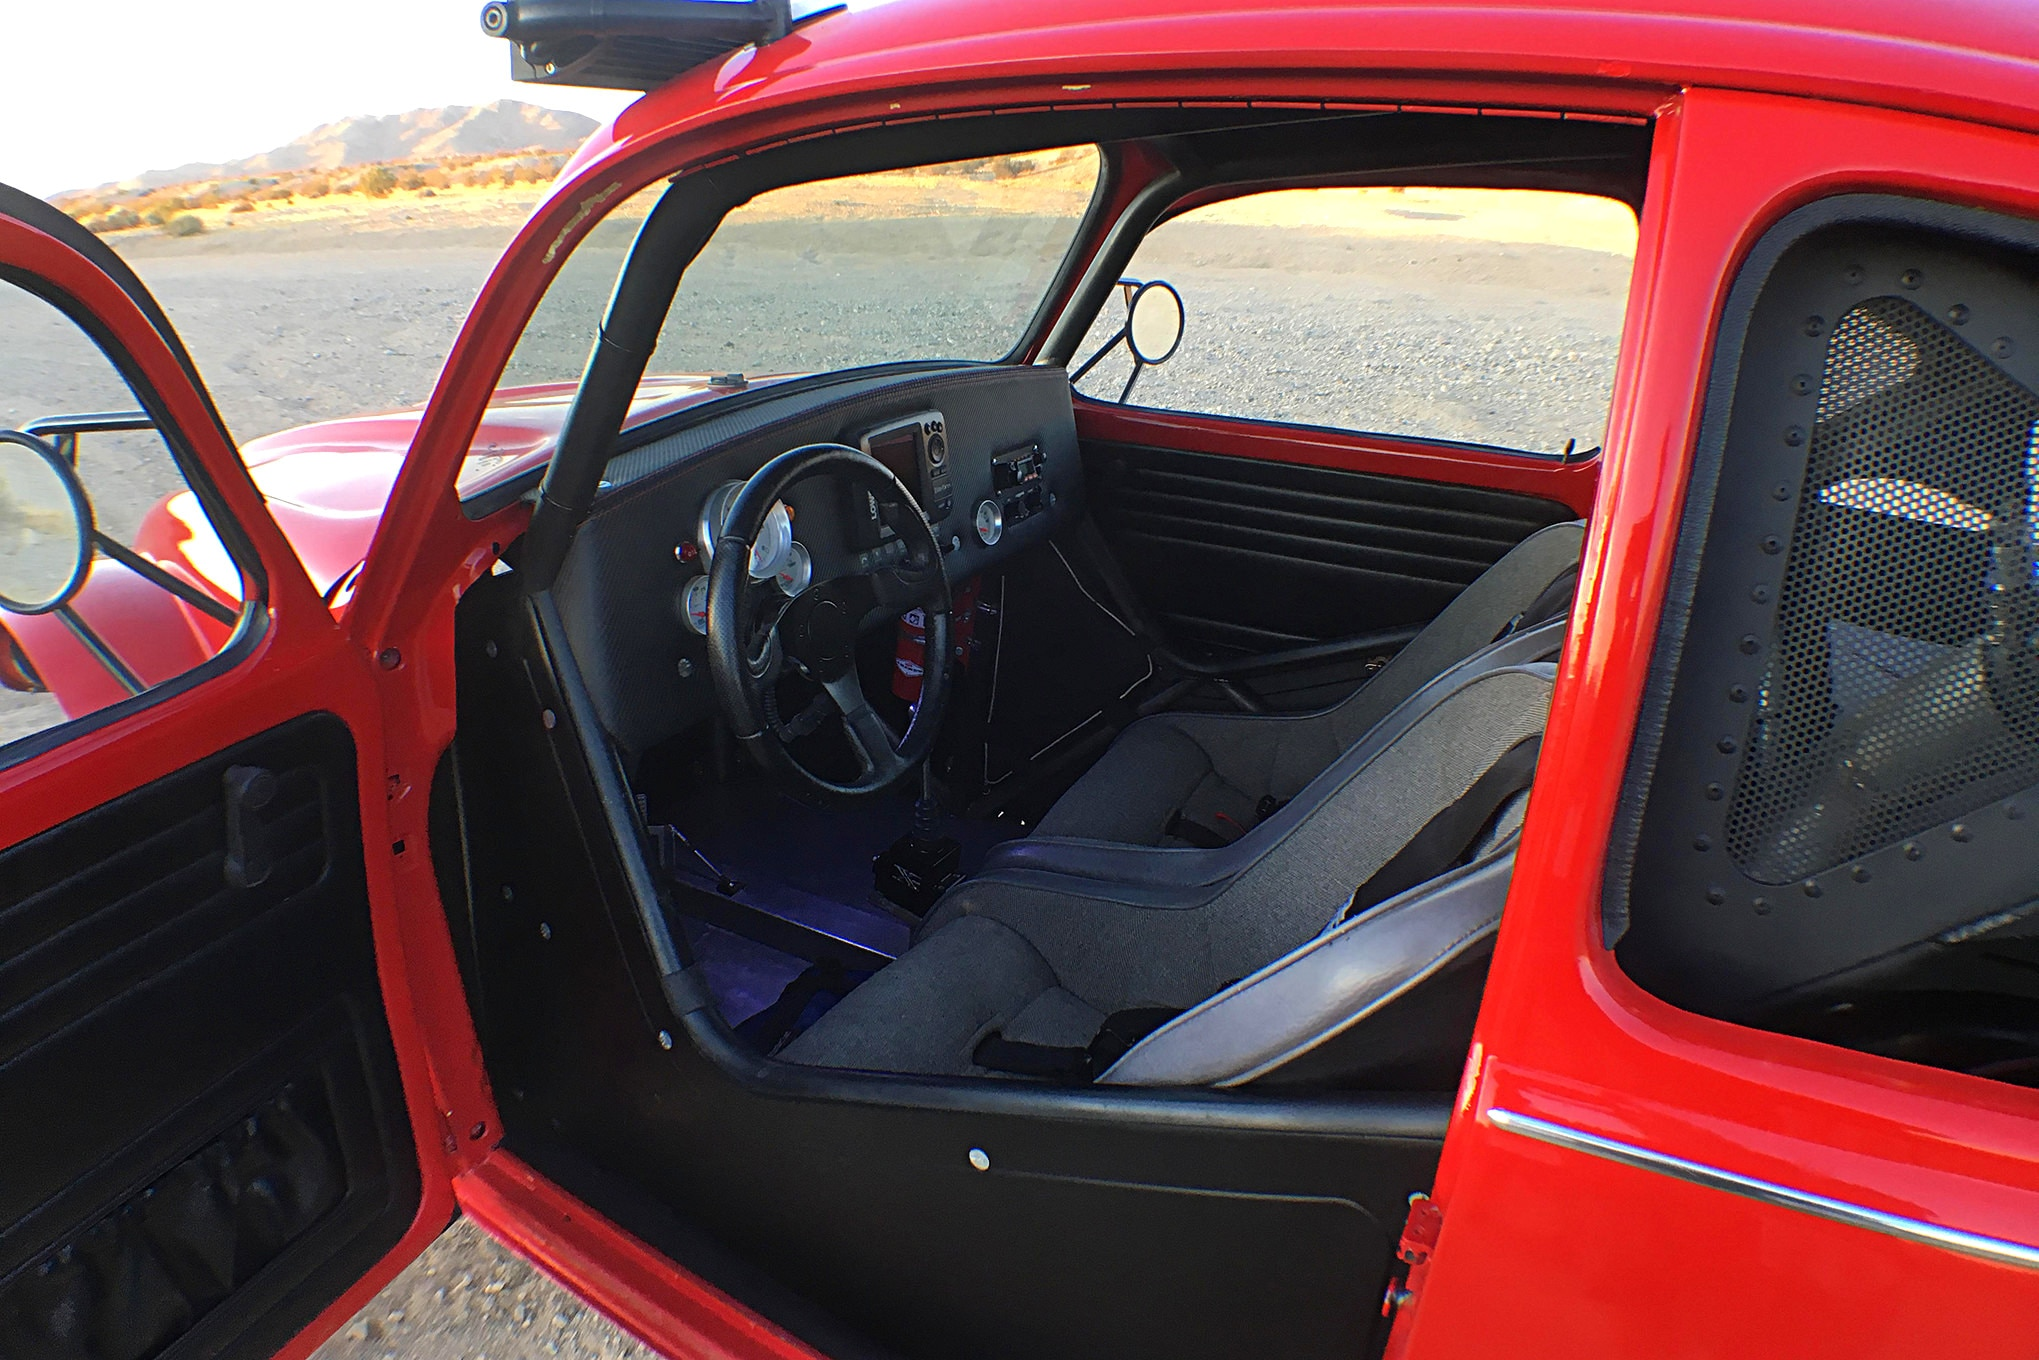 022 vw baja bug auto meter grant prp lowrance rugged pci pro am interior wide.JPG